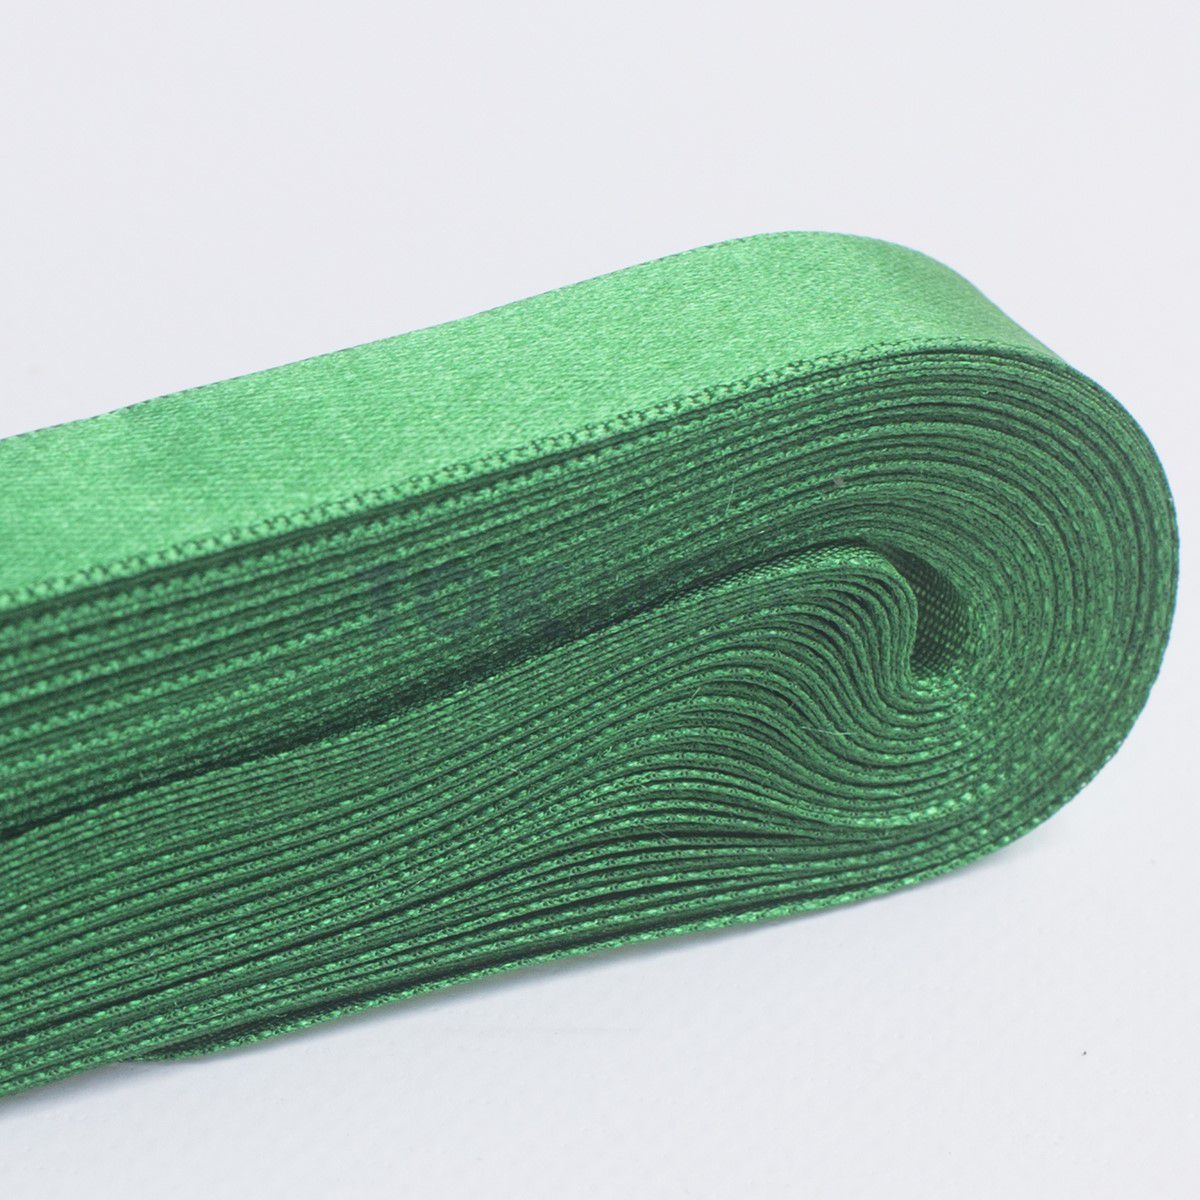 Fita Cetim N.2 - 10mm - 10 Metros - COR (23) Verde Bandeira